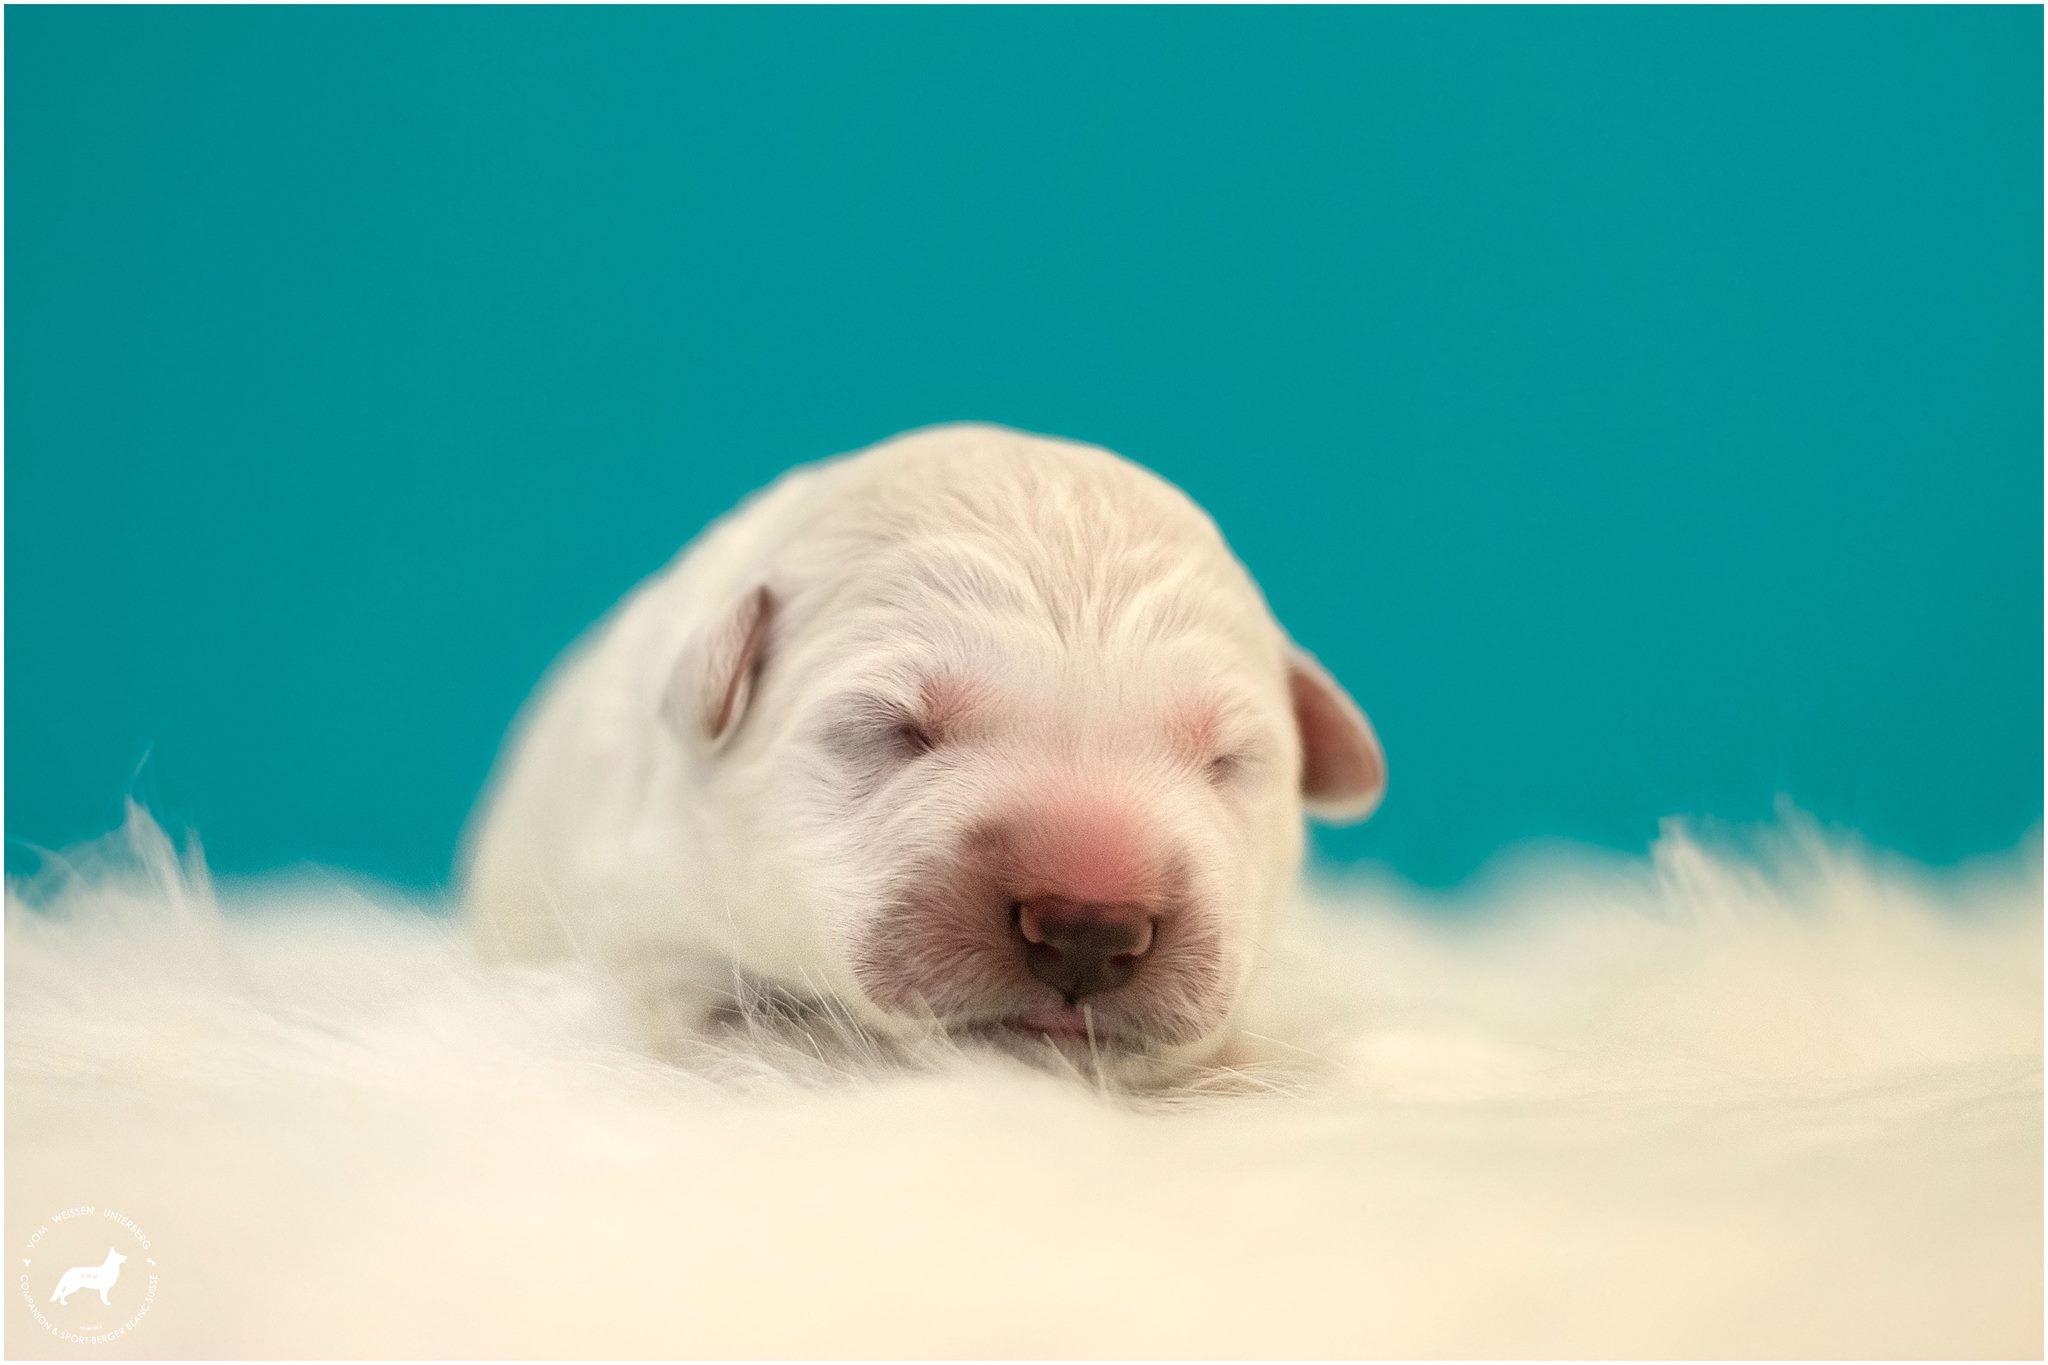 We have puppies <3